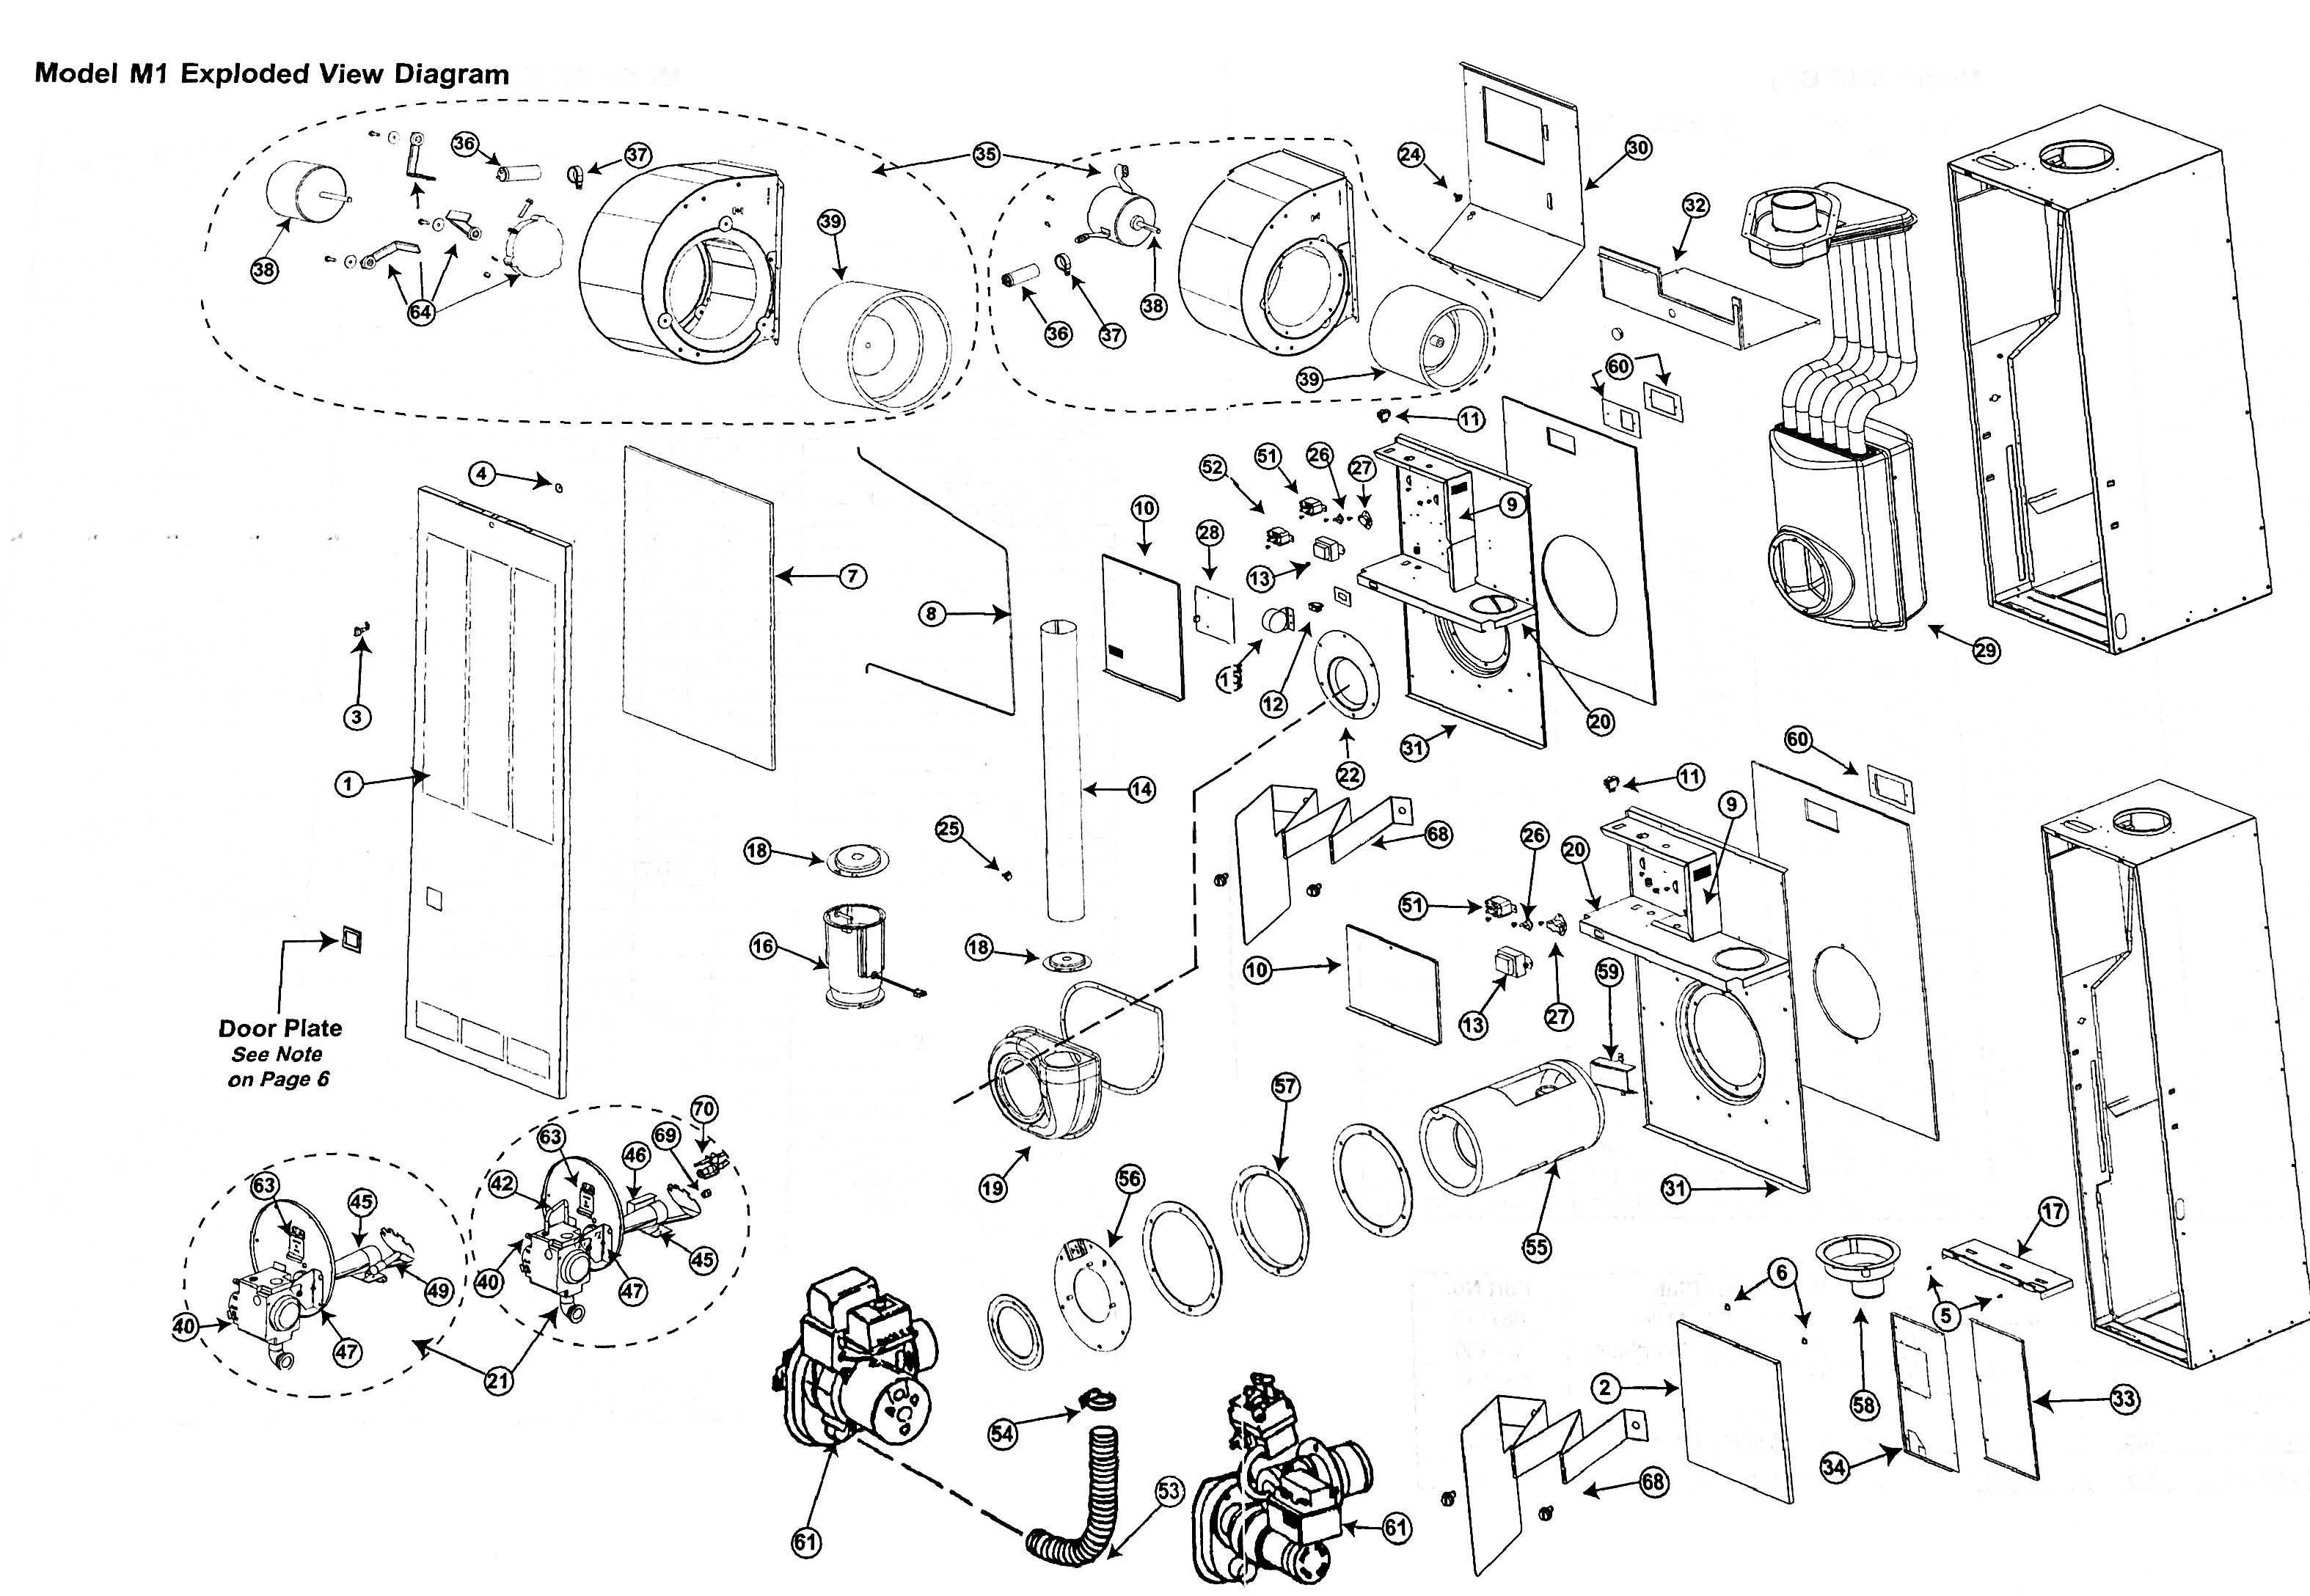 Gas Log Valve Wiring Diagram - Auto Electrical Wiring Diagram J Plssm Wiring Diagram on